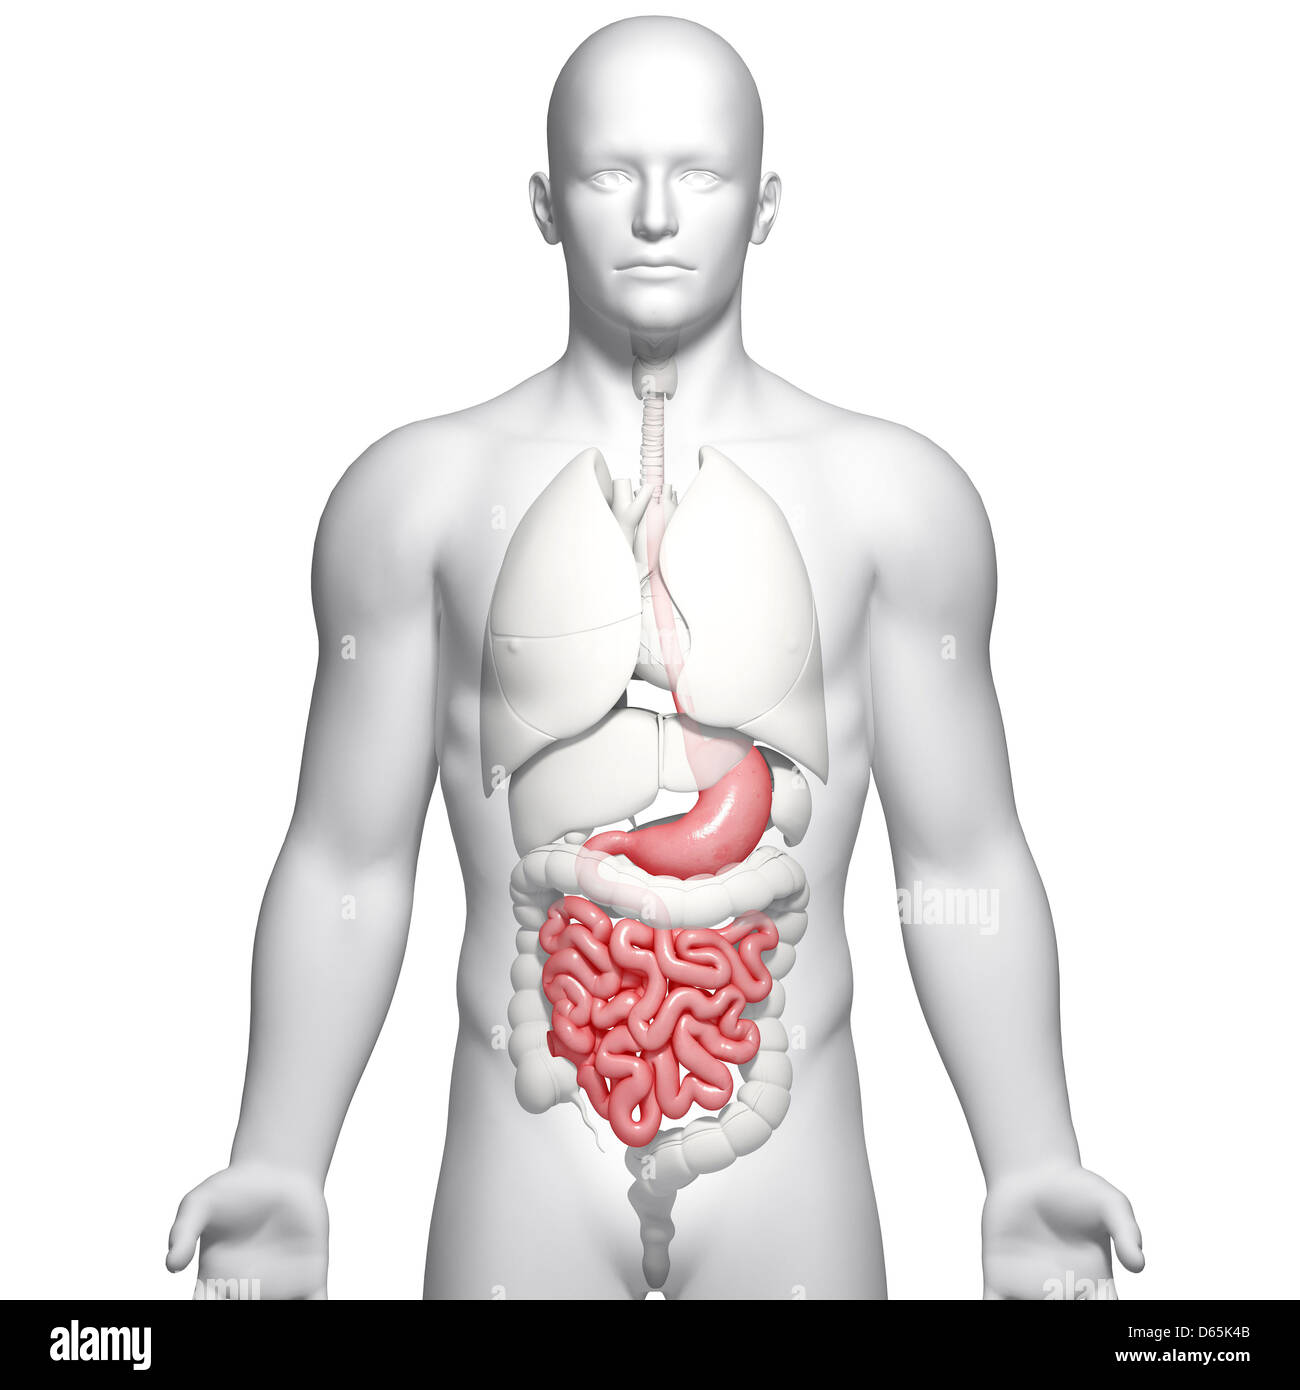 Male Digestive System Stockfotos & Male Digestive System Bilder - Alamy